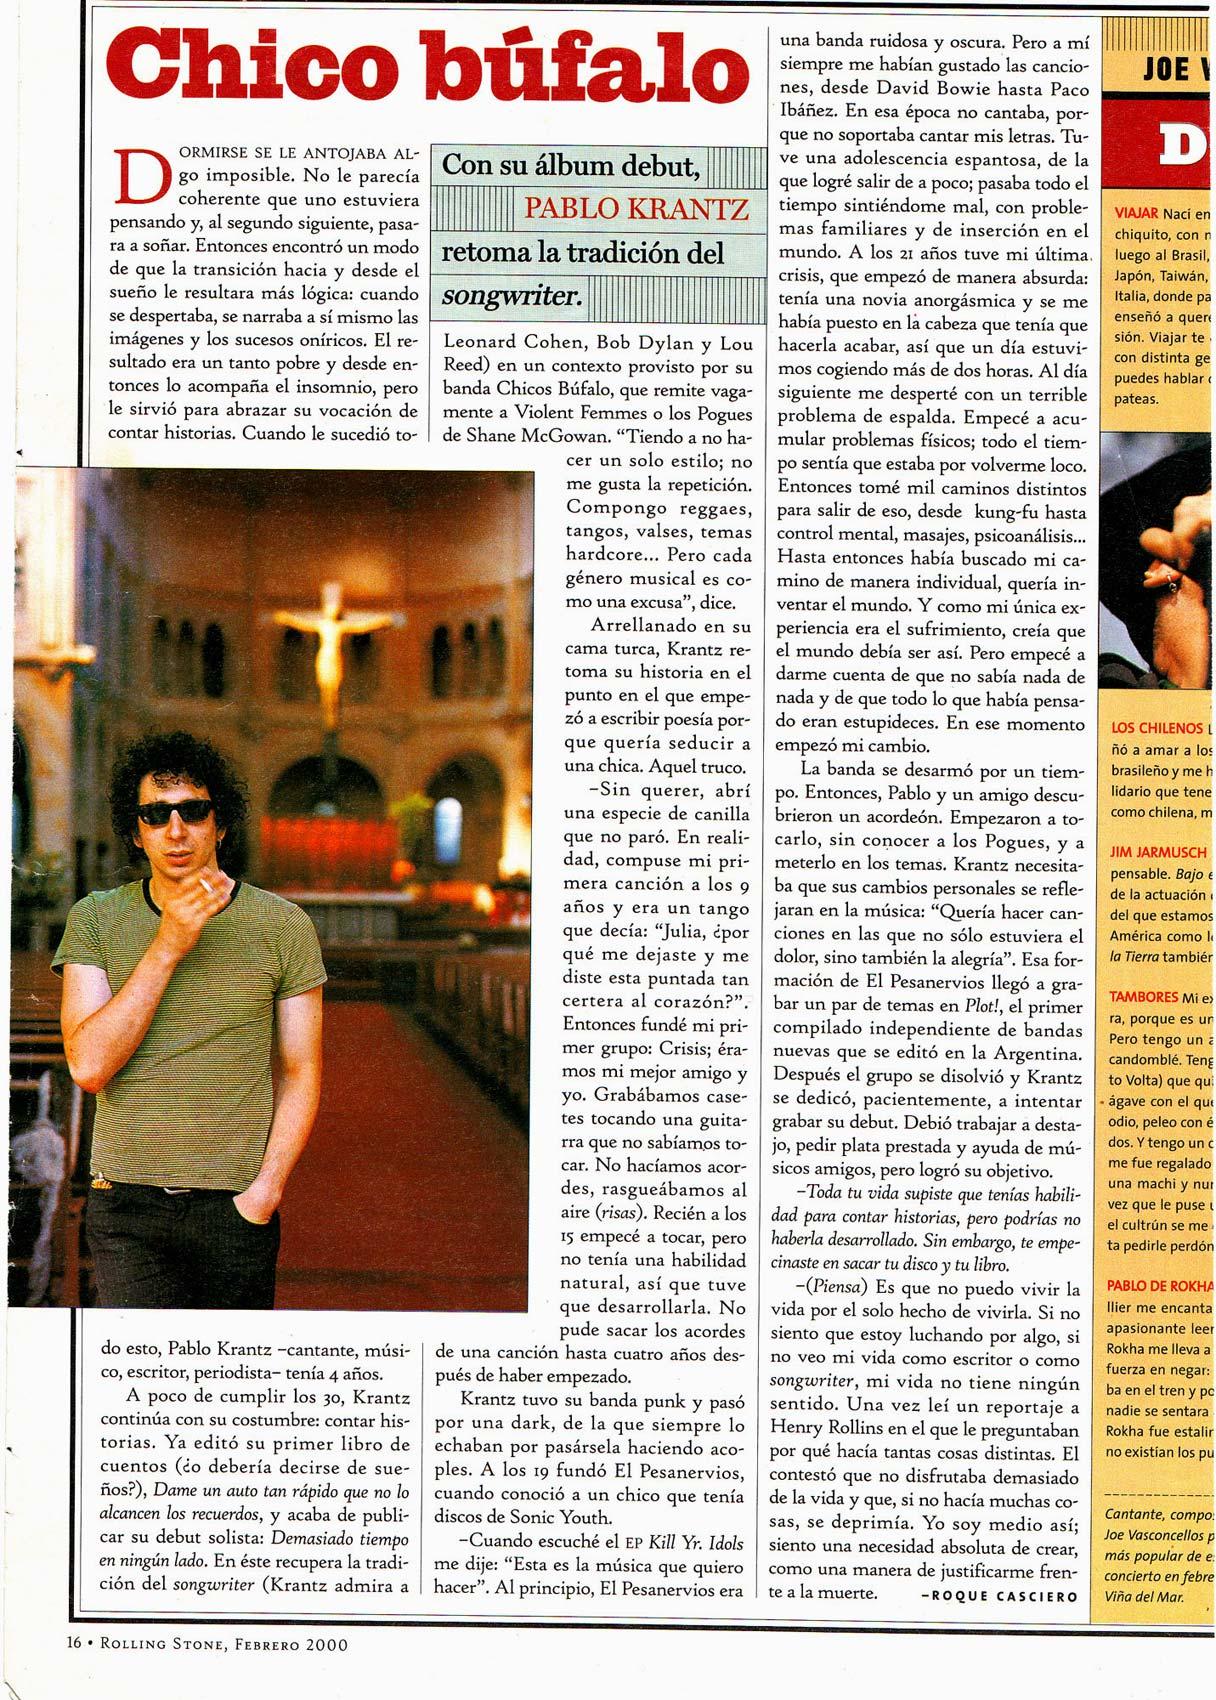 Revista Rolling Stone, Argentina, 1999